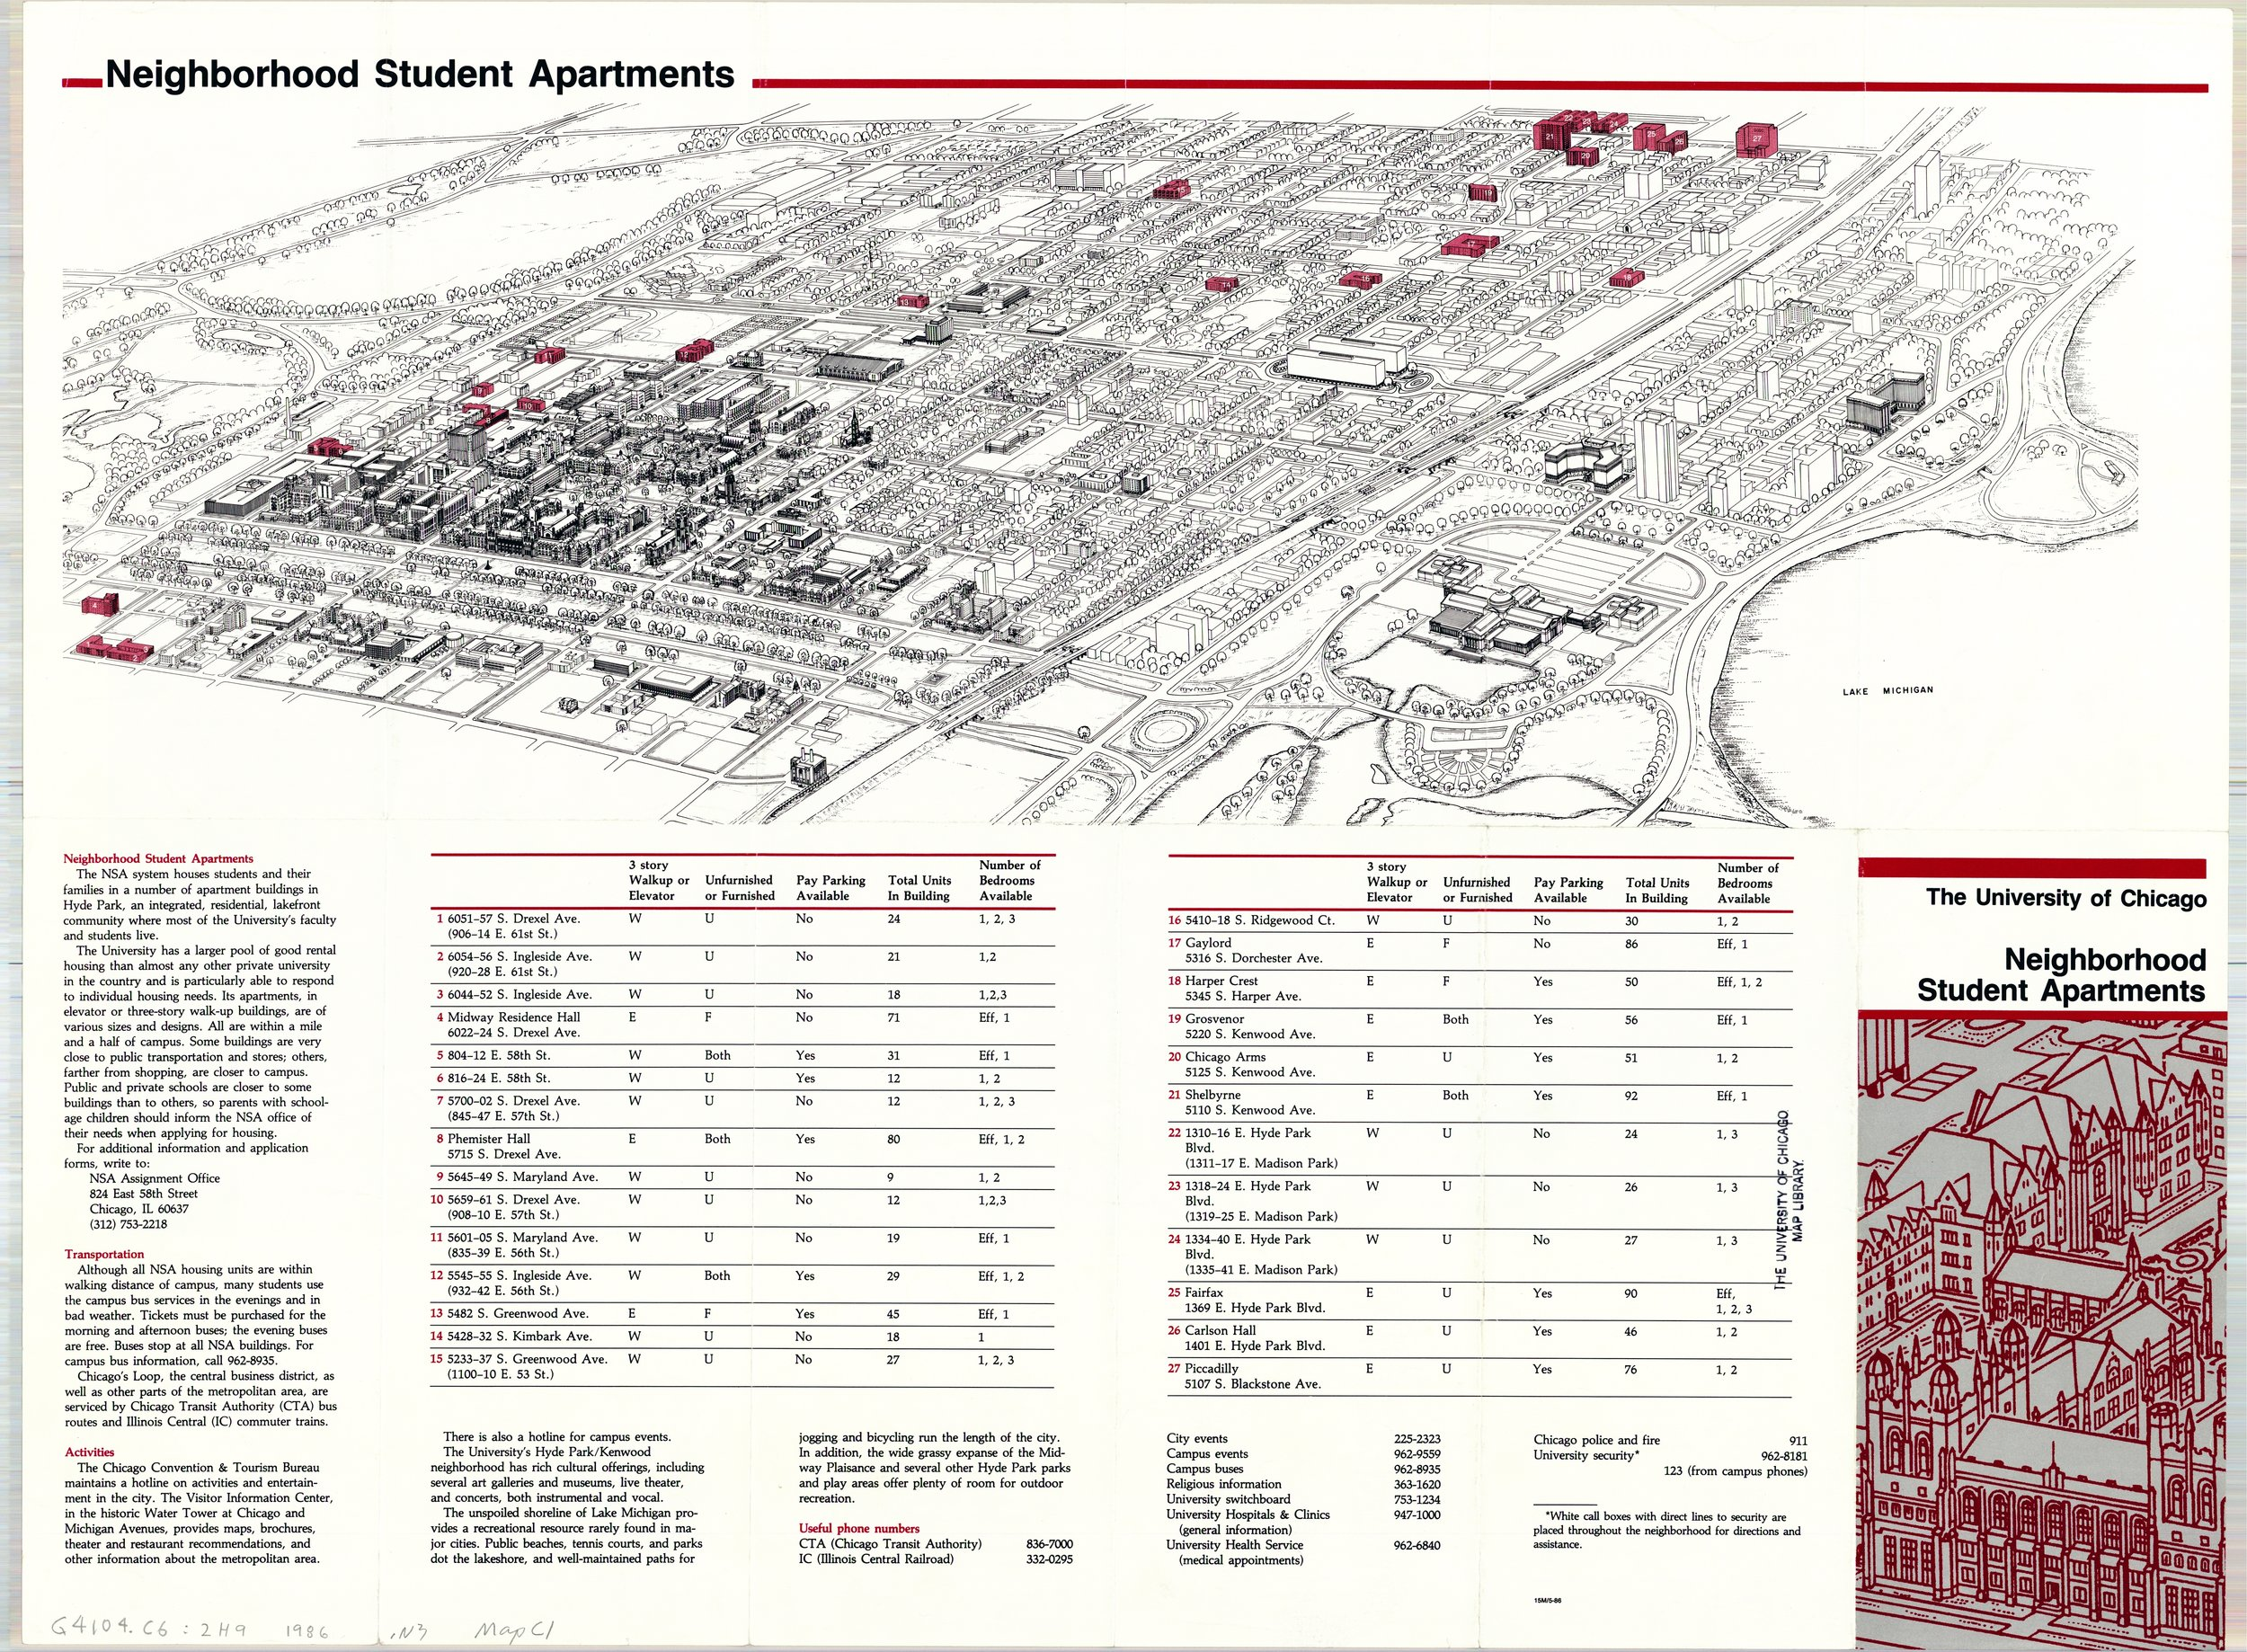 Neighborhood Student Apartments, 1986